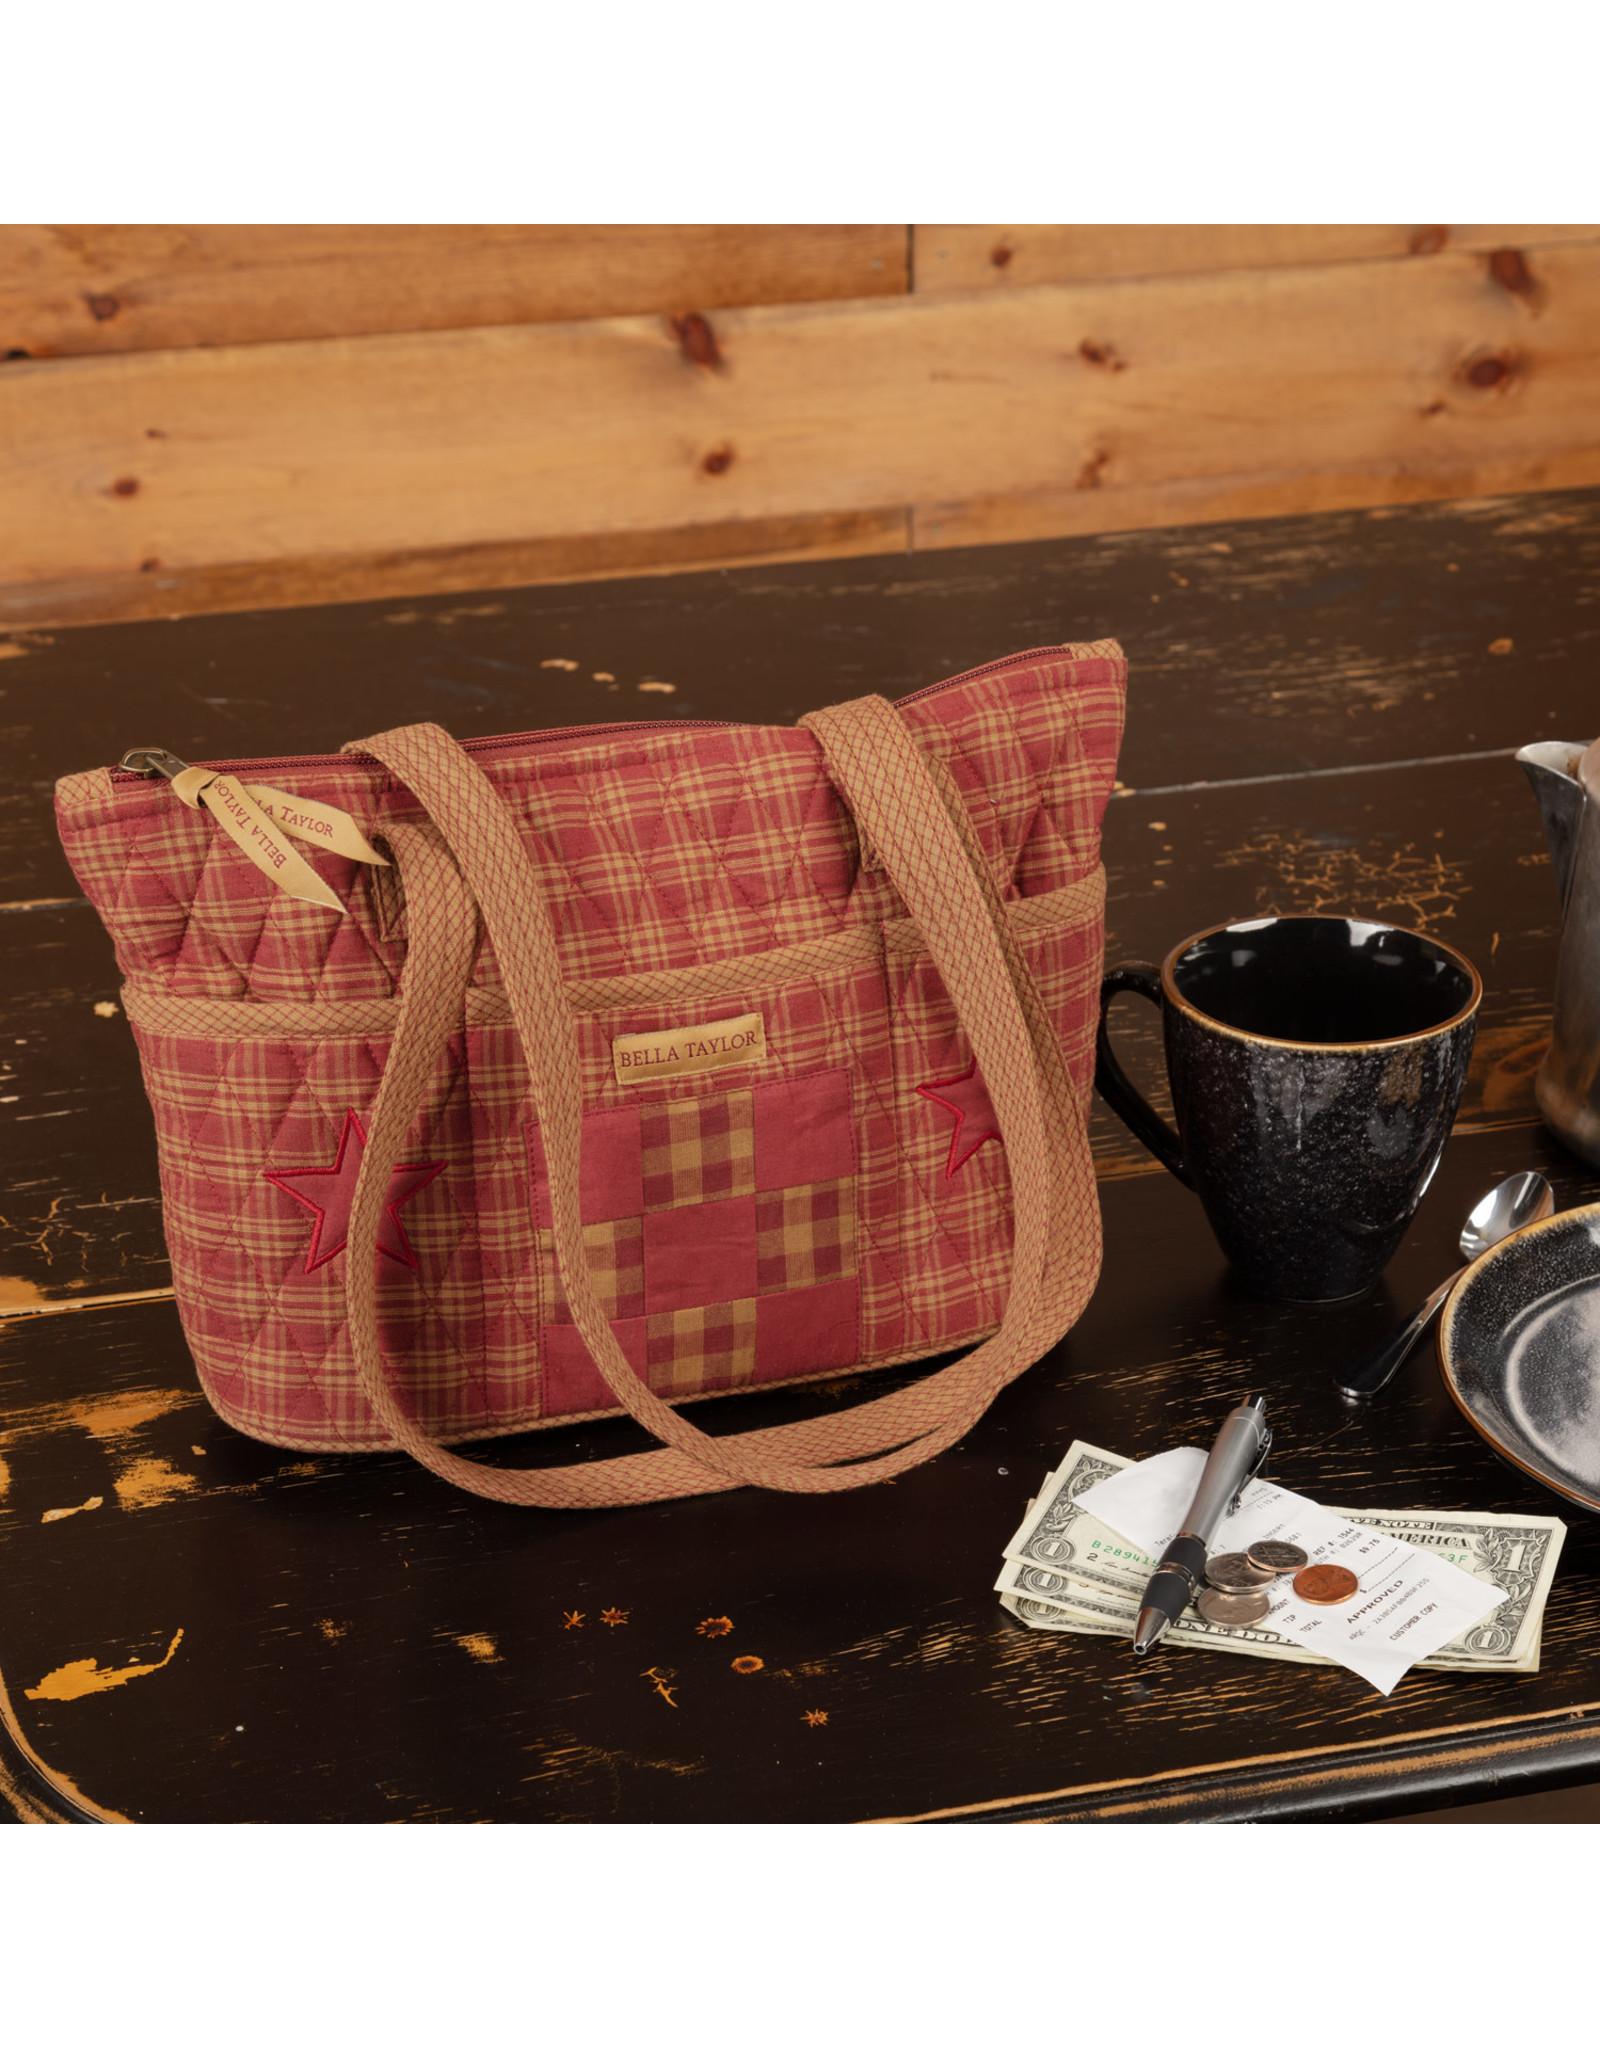 Bella Taylor Ninepatch Star - Taylor handbag